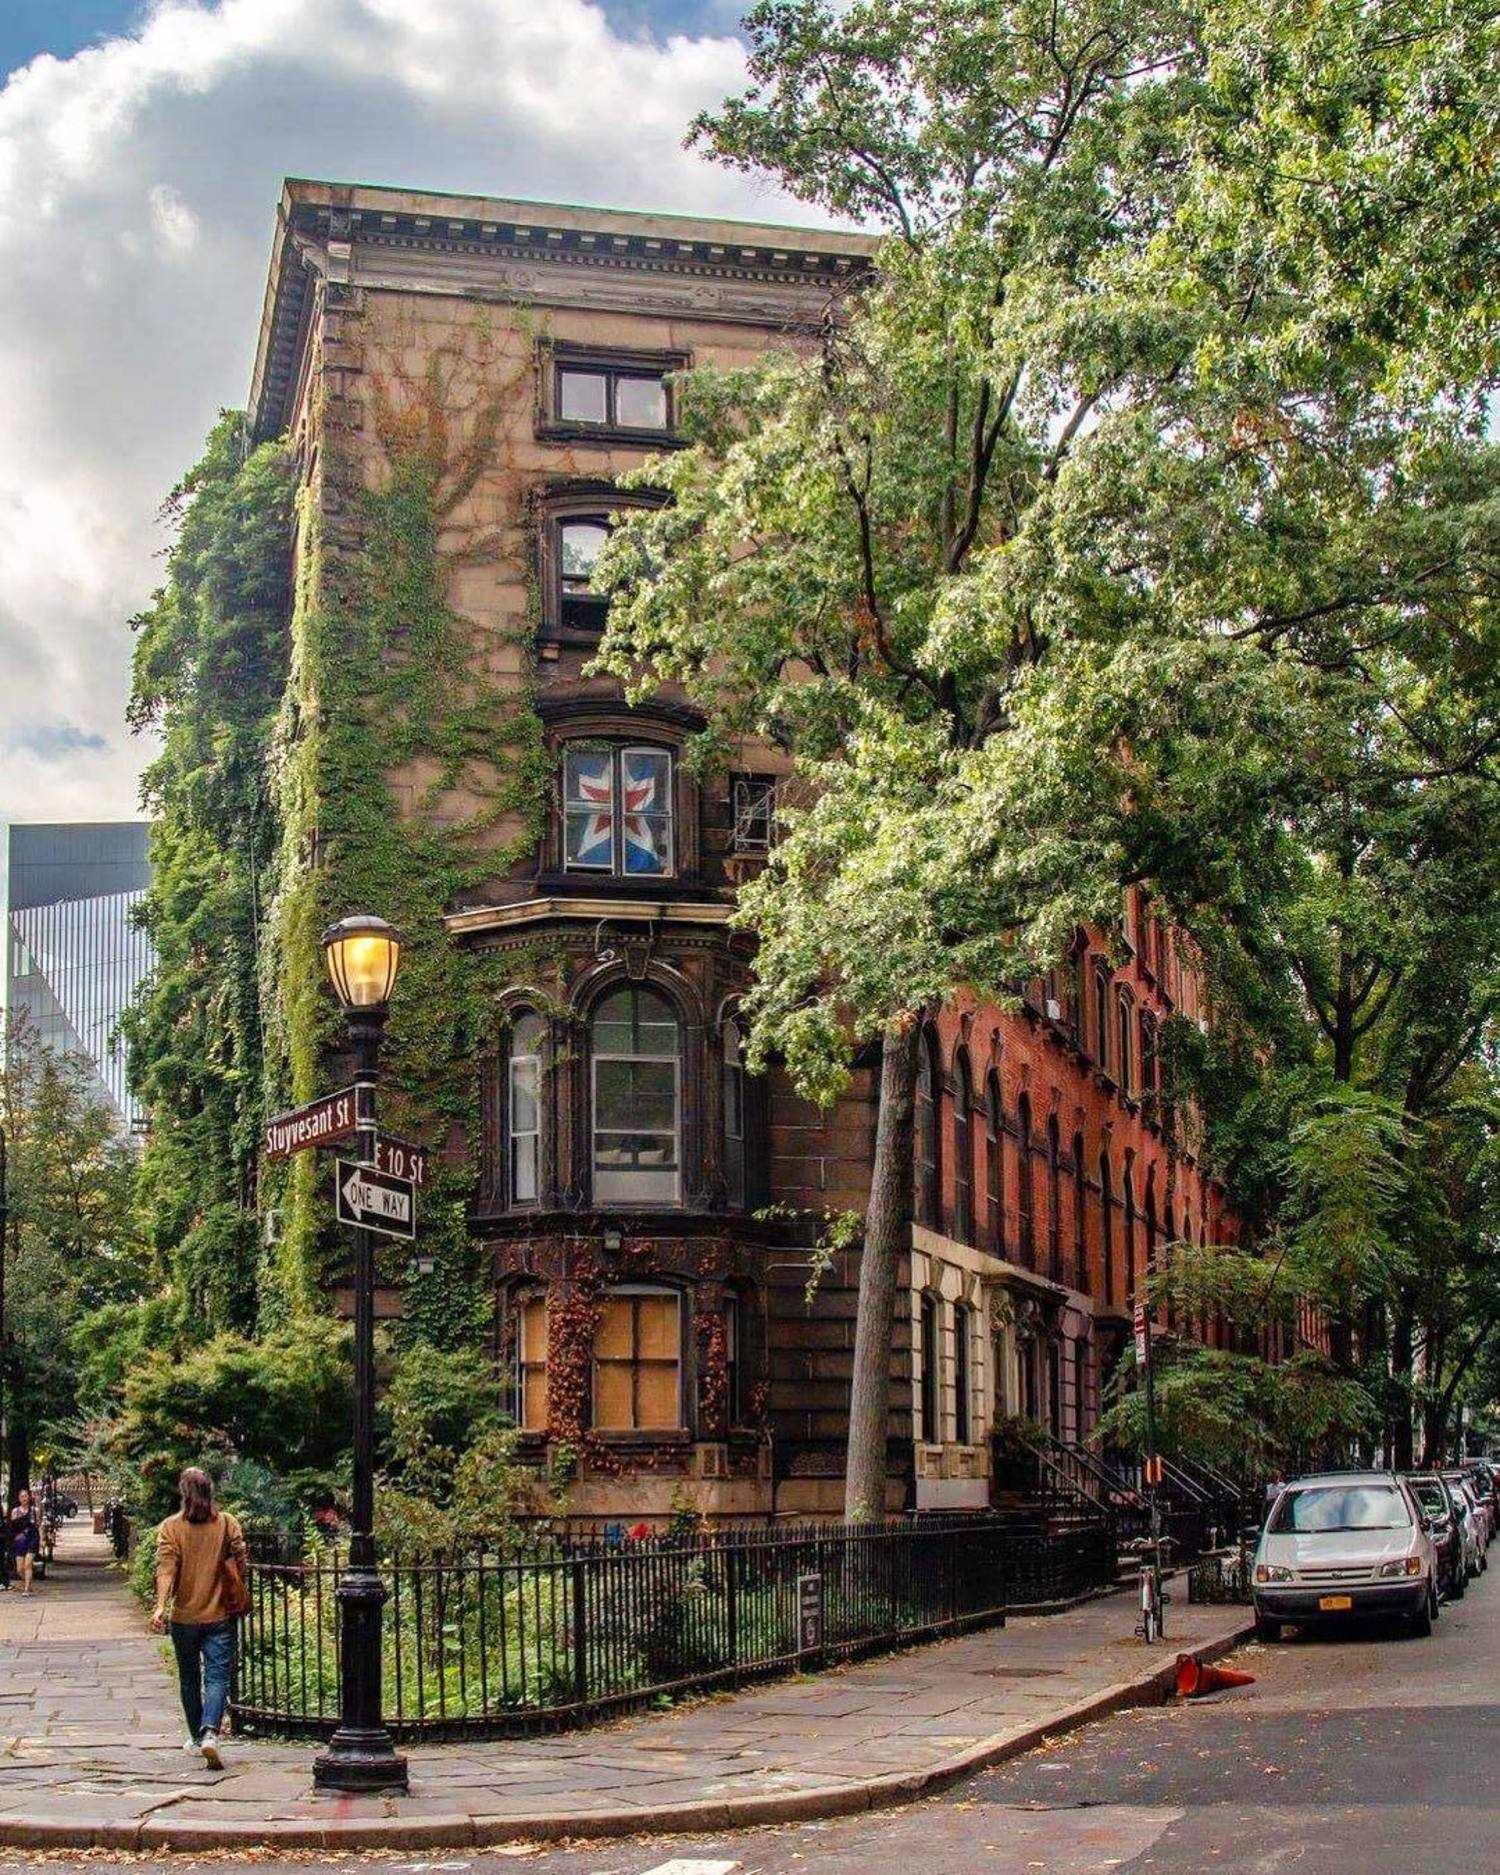 Abe Lebewohl Park, E 10th Street and Stuyvesant Street, East Village, Manhattan